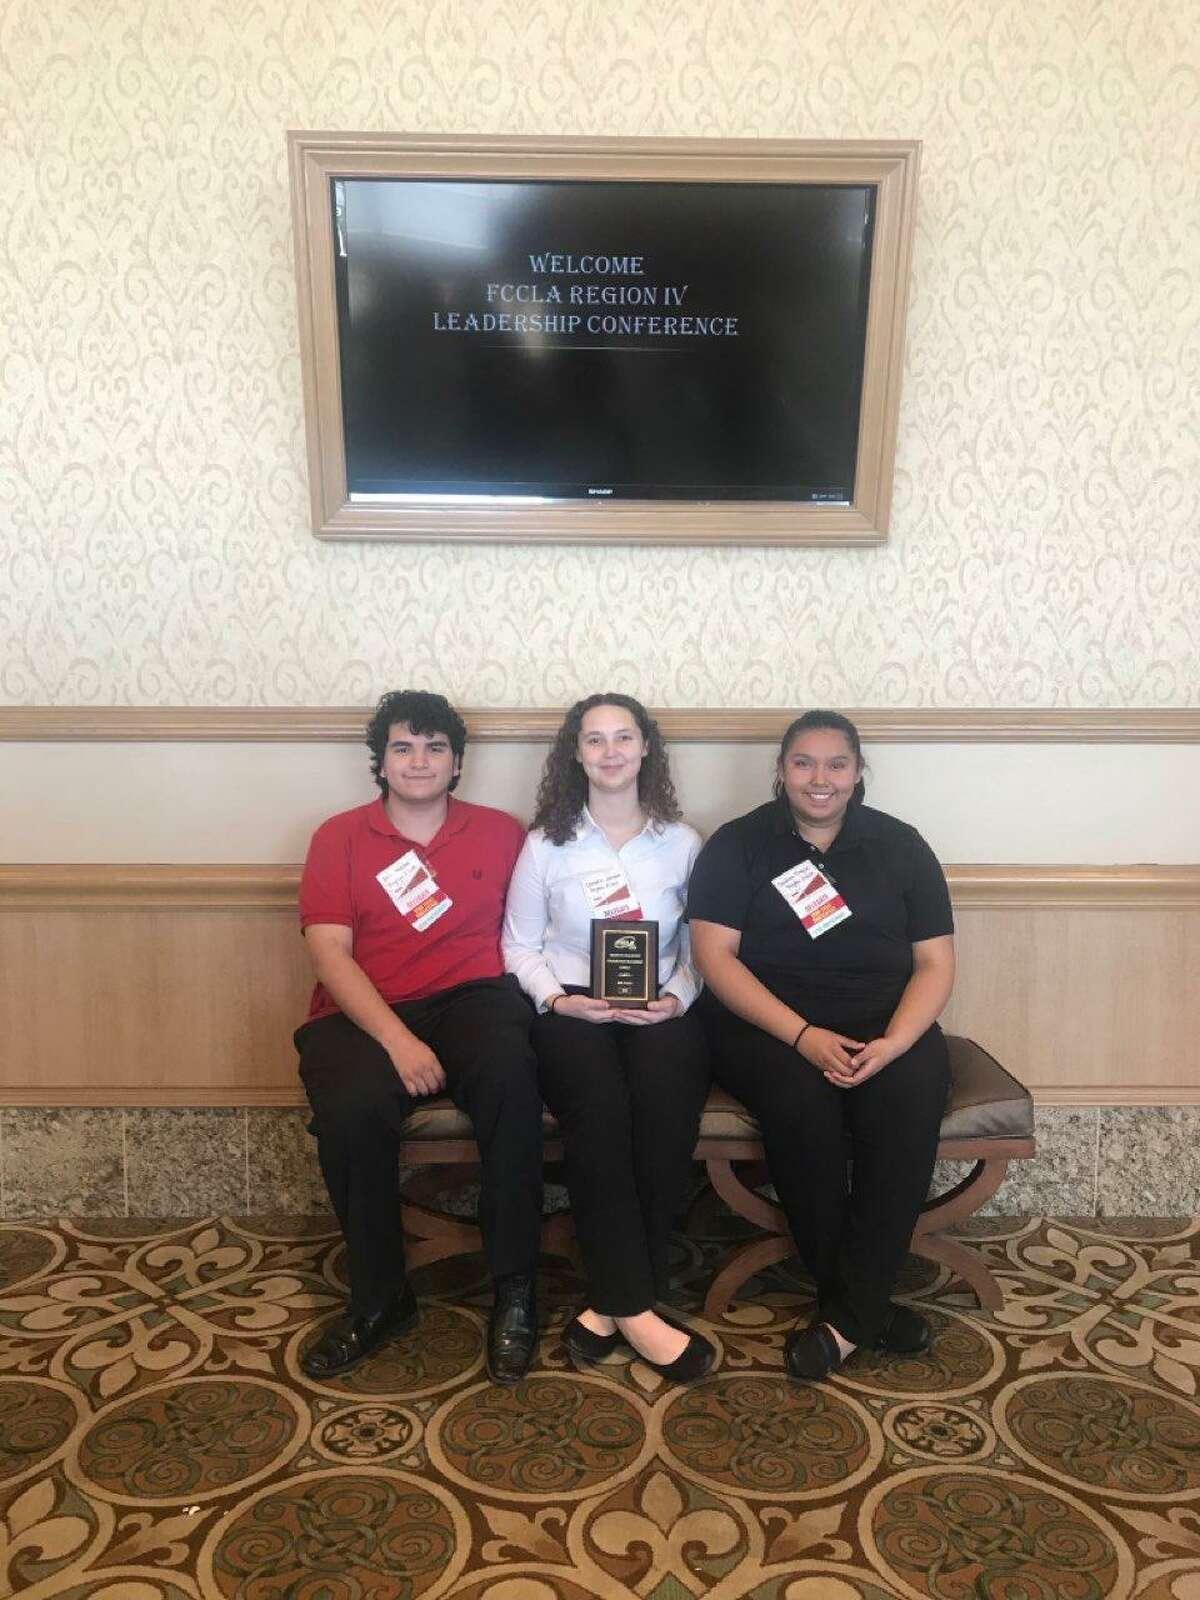 The Culinary Math Management team of Erik Medellin, Cherokee Johnson and Carolina Tinajero won fourth place at state.